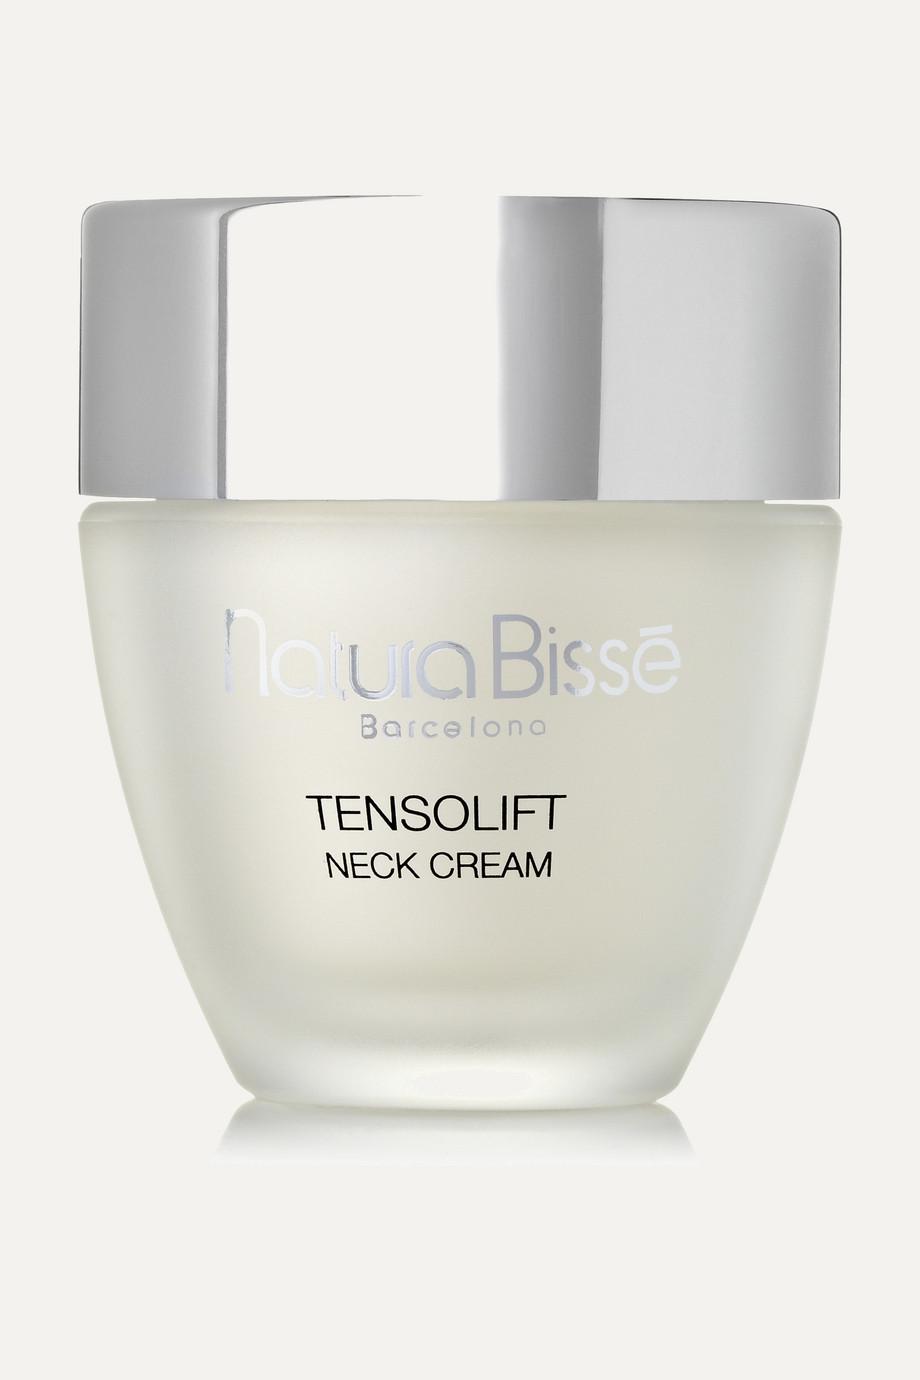 Natura Bissé Tensolift Neck Cream, 50ml